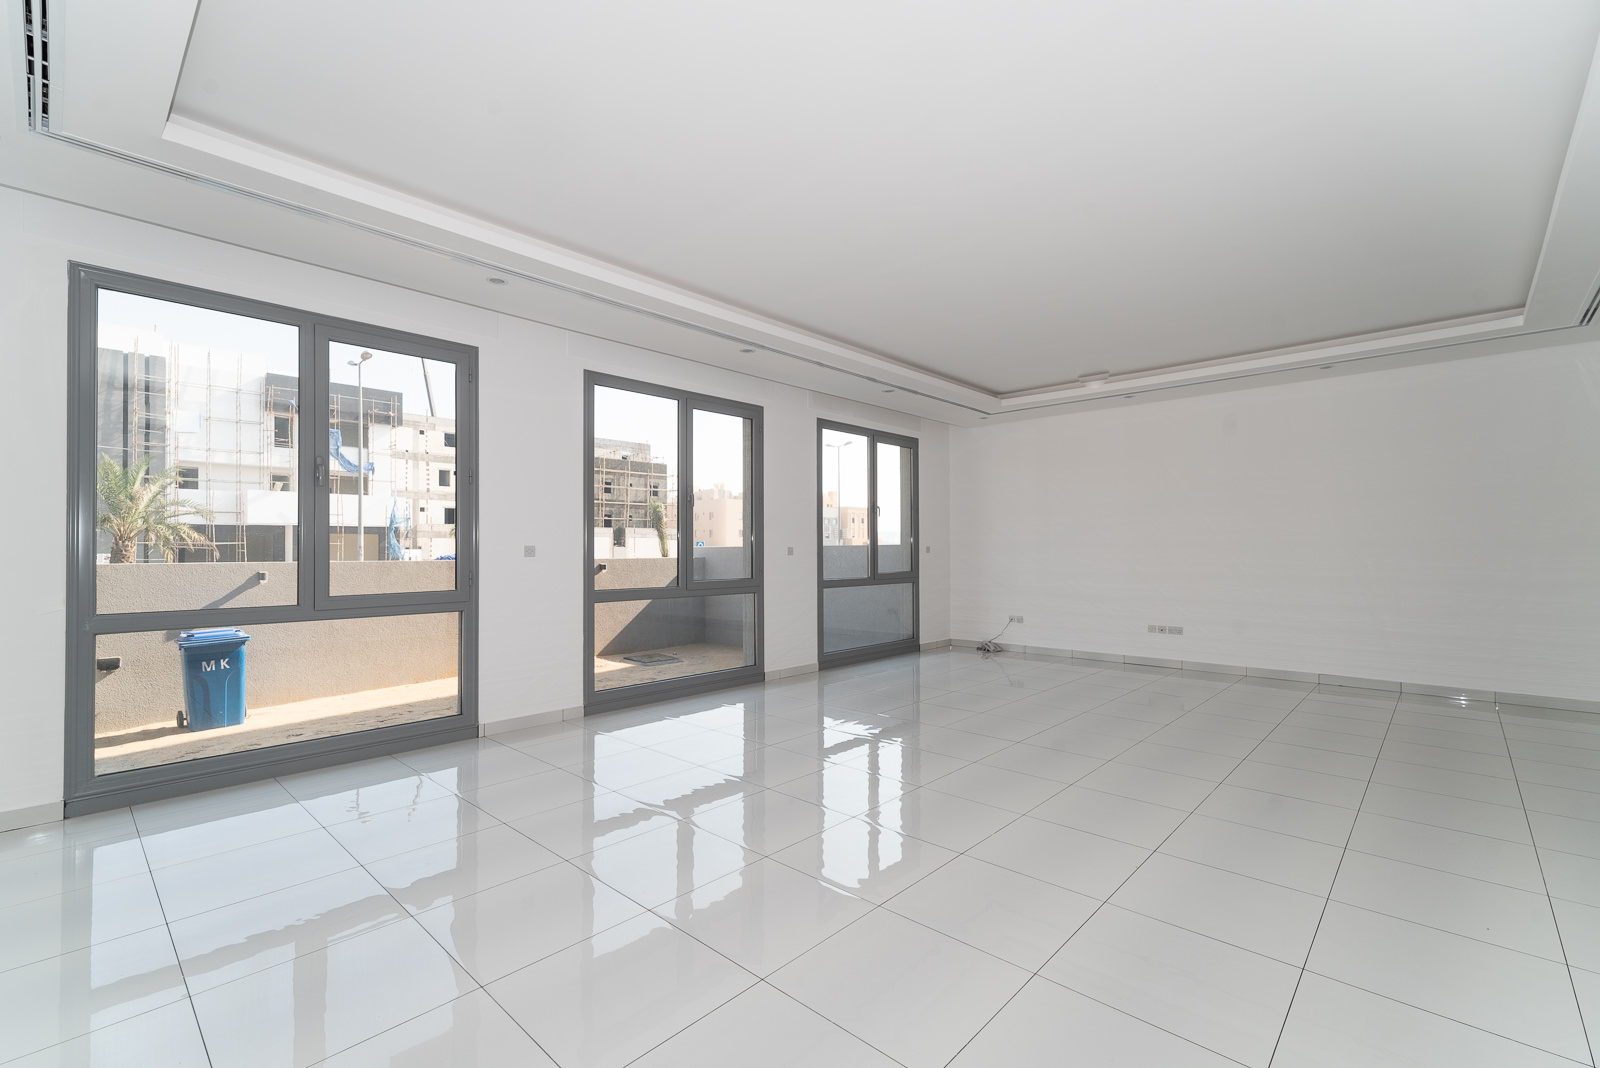 Siddeeq – new, modern, five bedroom villas